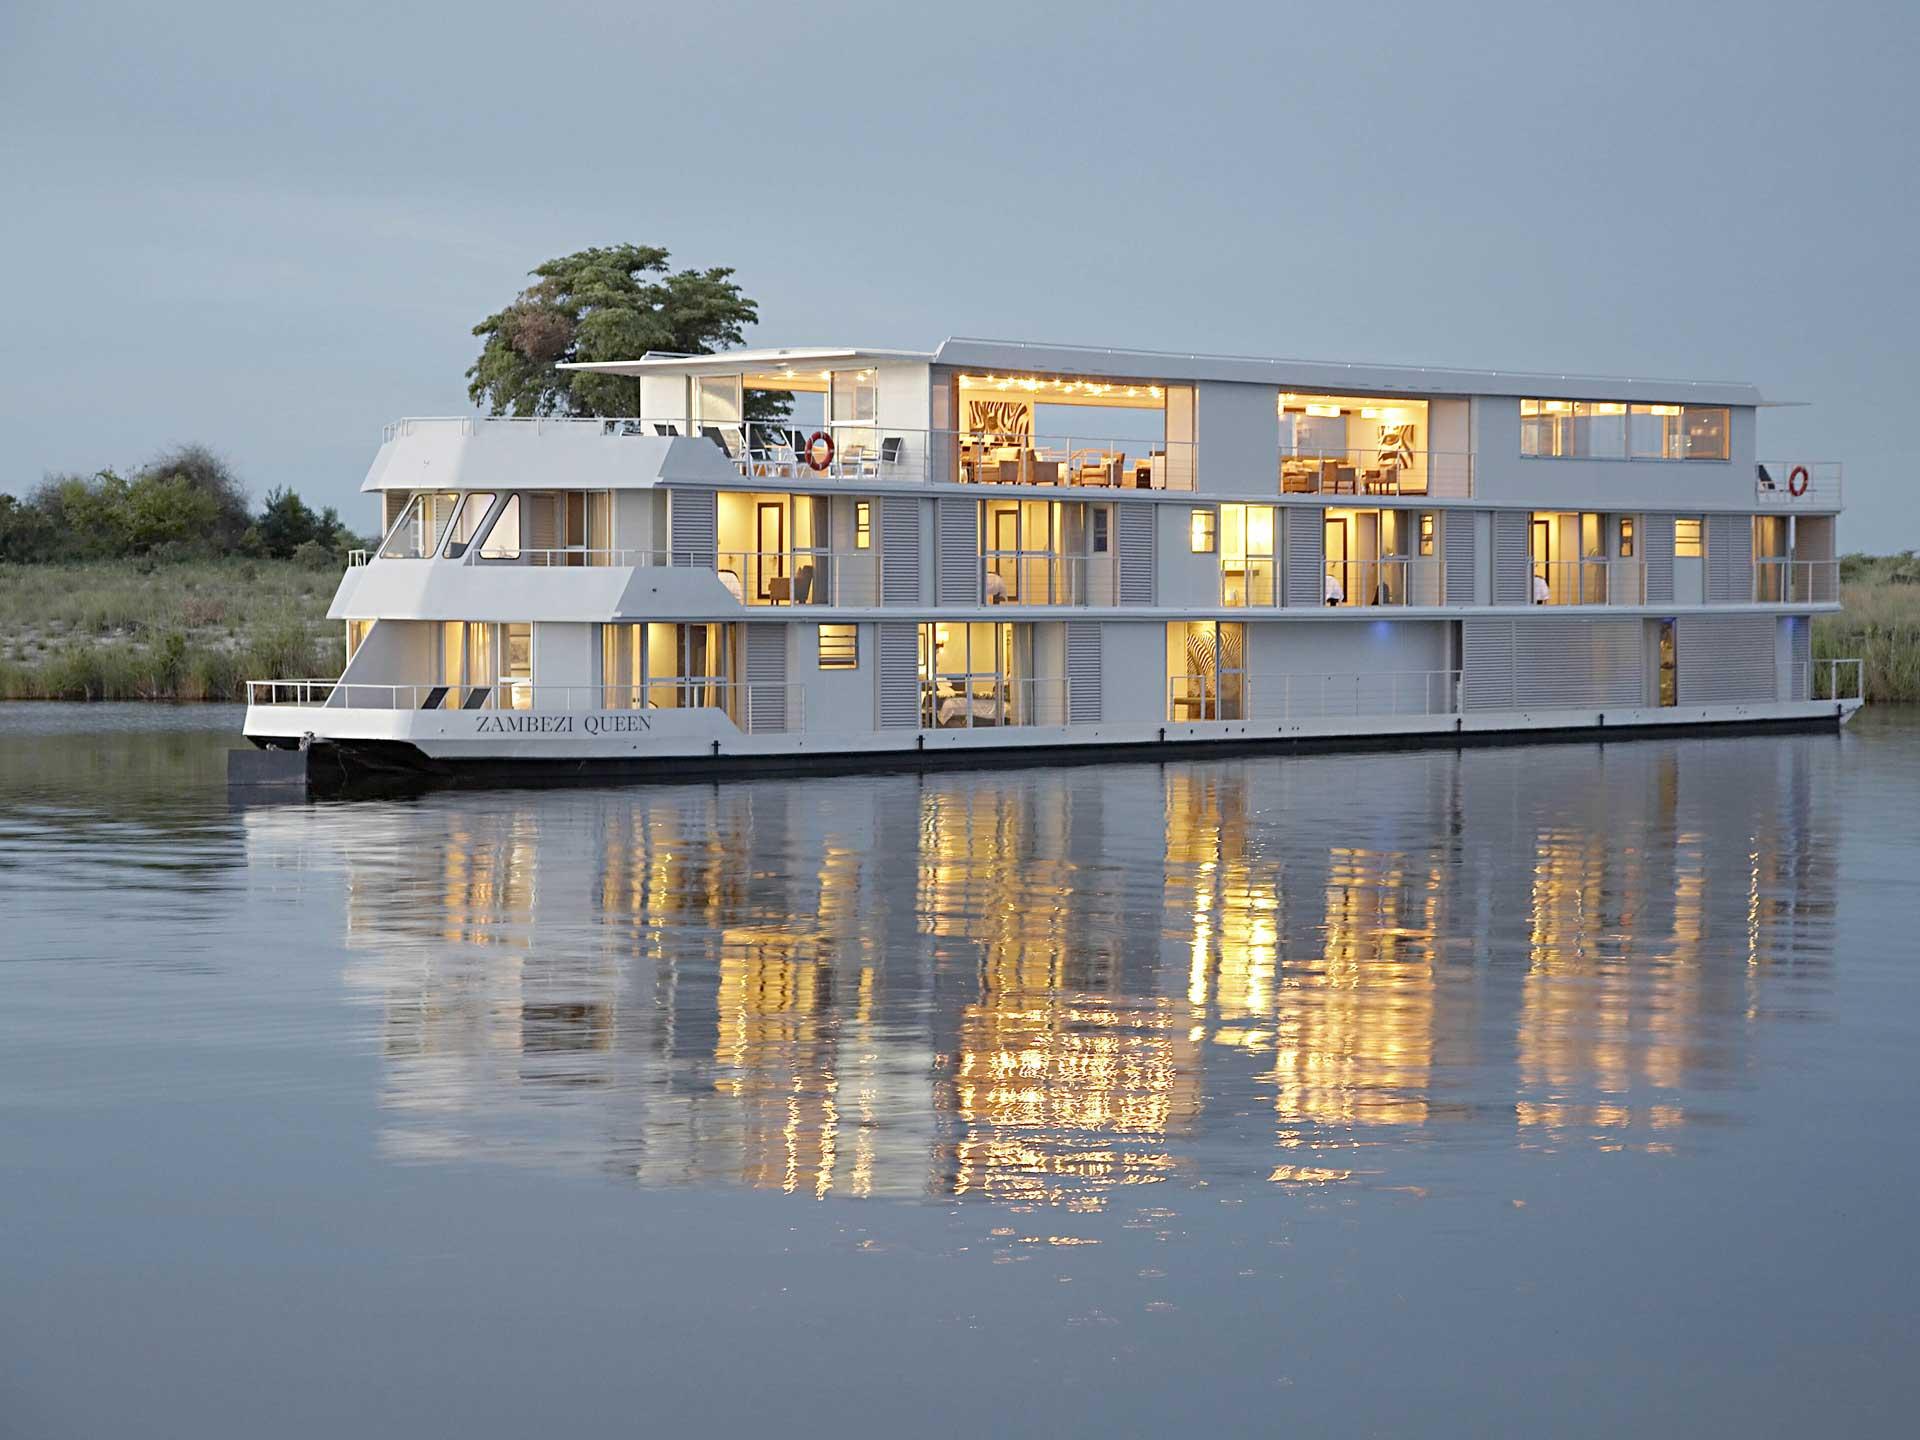 Zambezi queen Boot Luxus FLuss Kreuzfahrt Namibia Botswana